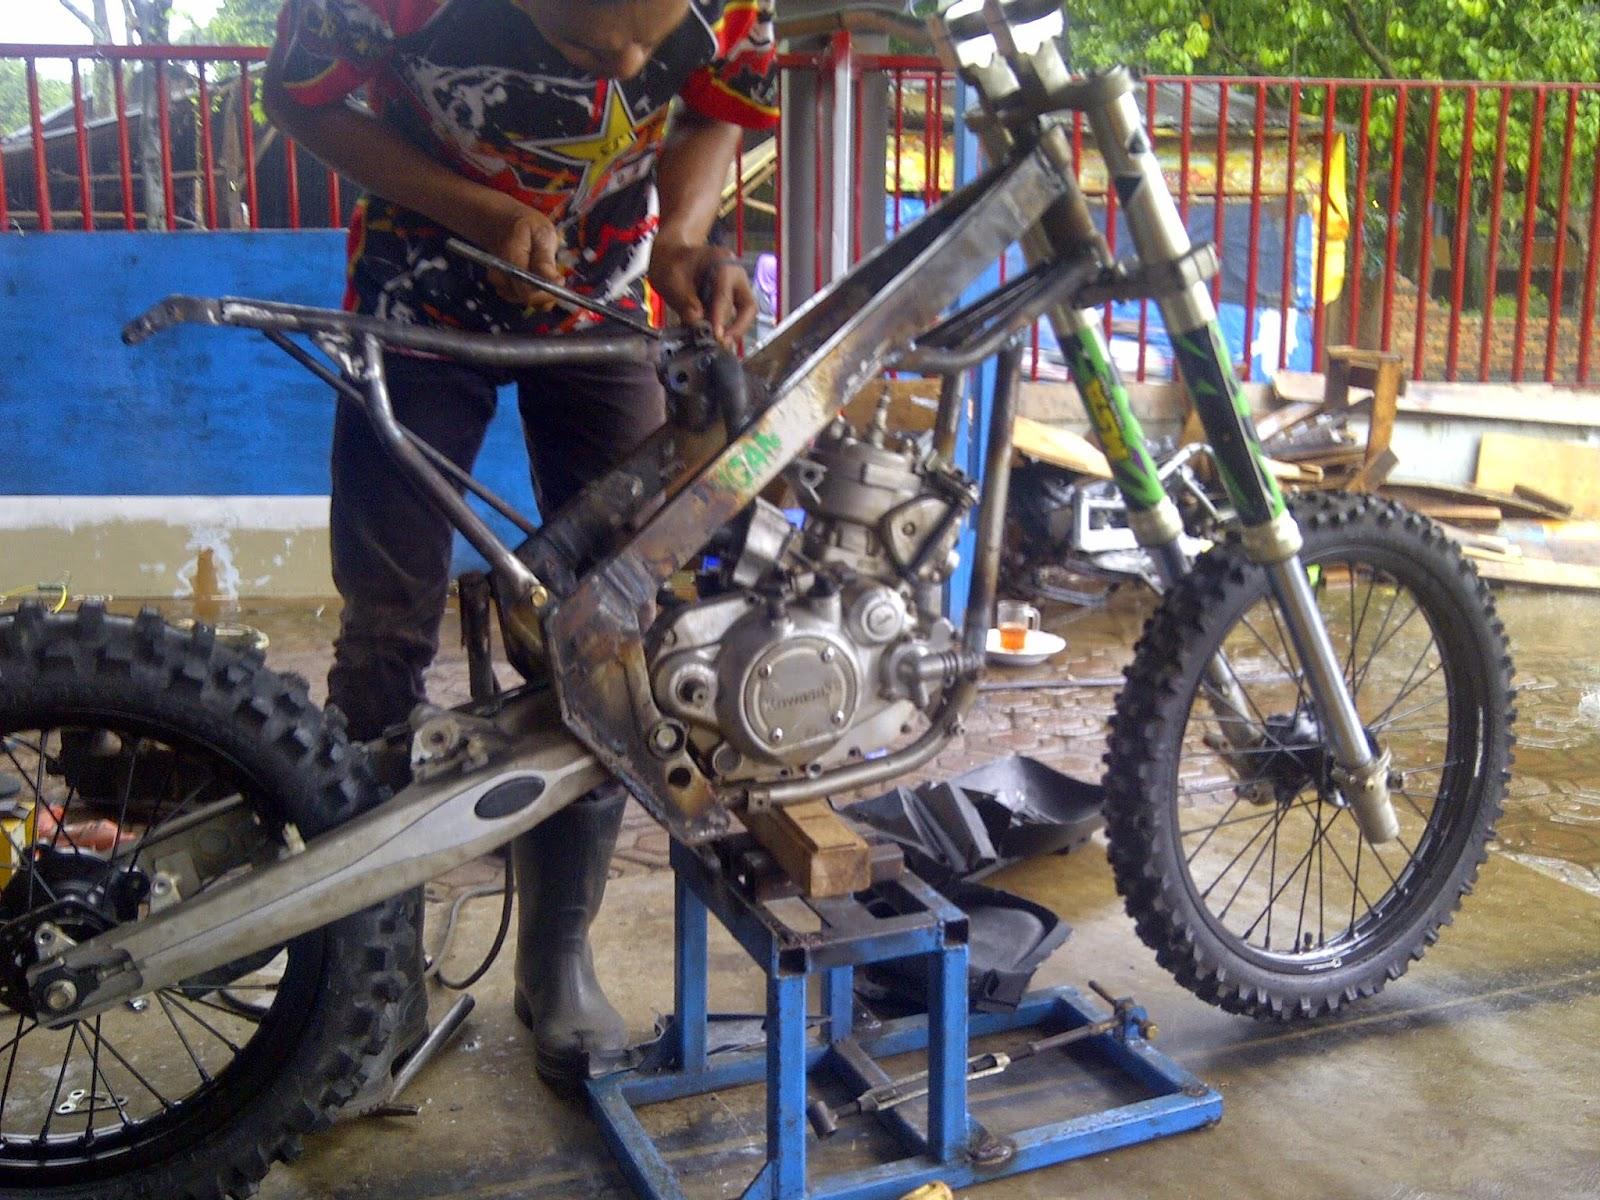 86 Modifikasi Motor Ninja Rr Jadi Trail Modifikasi Trail